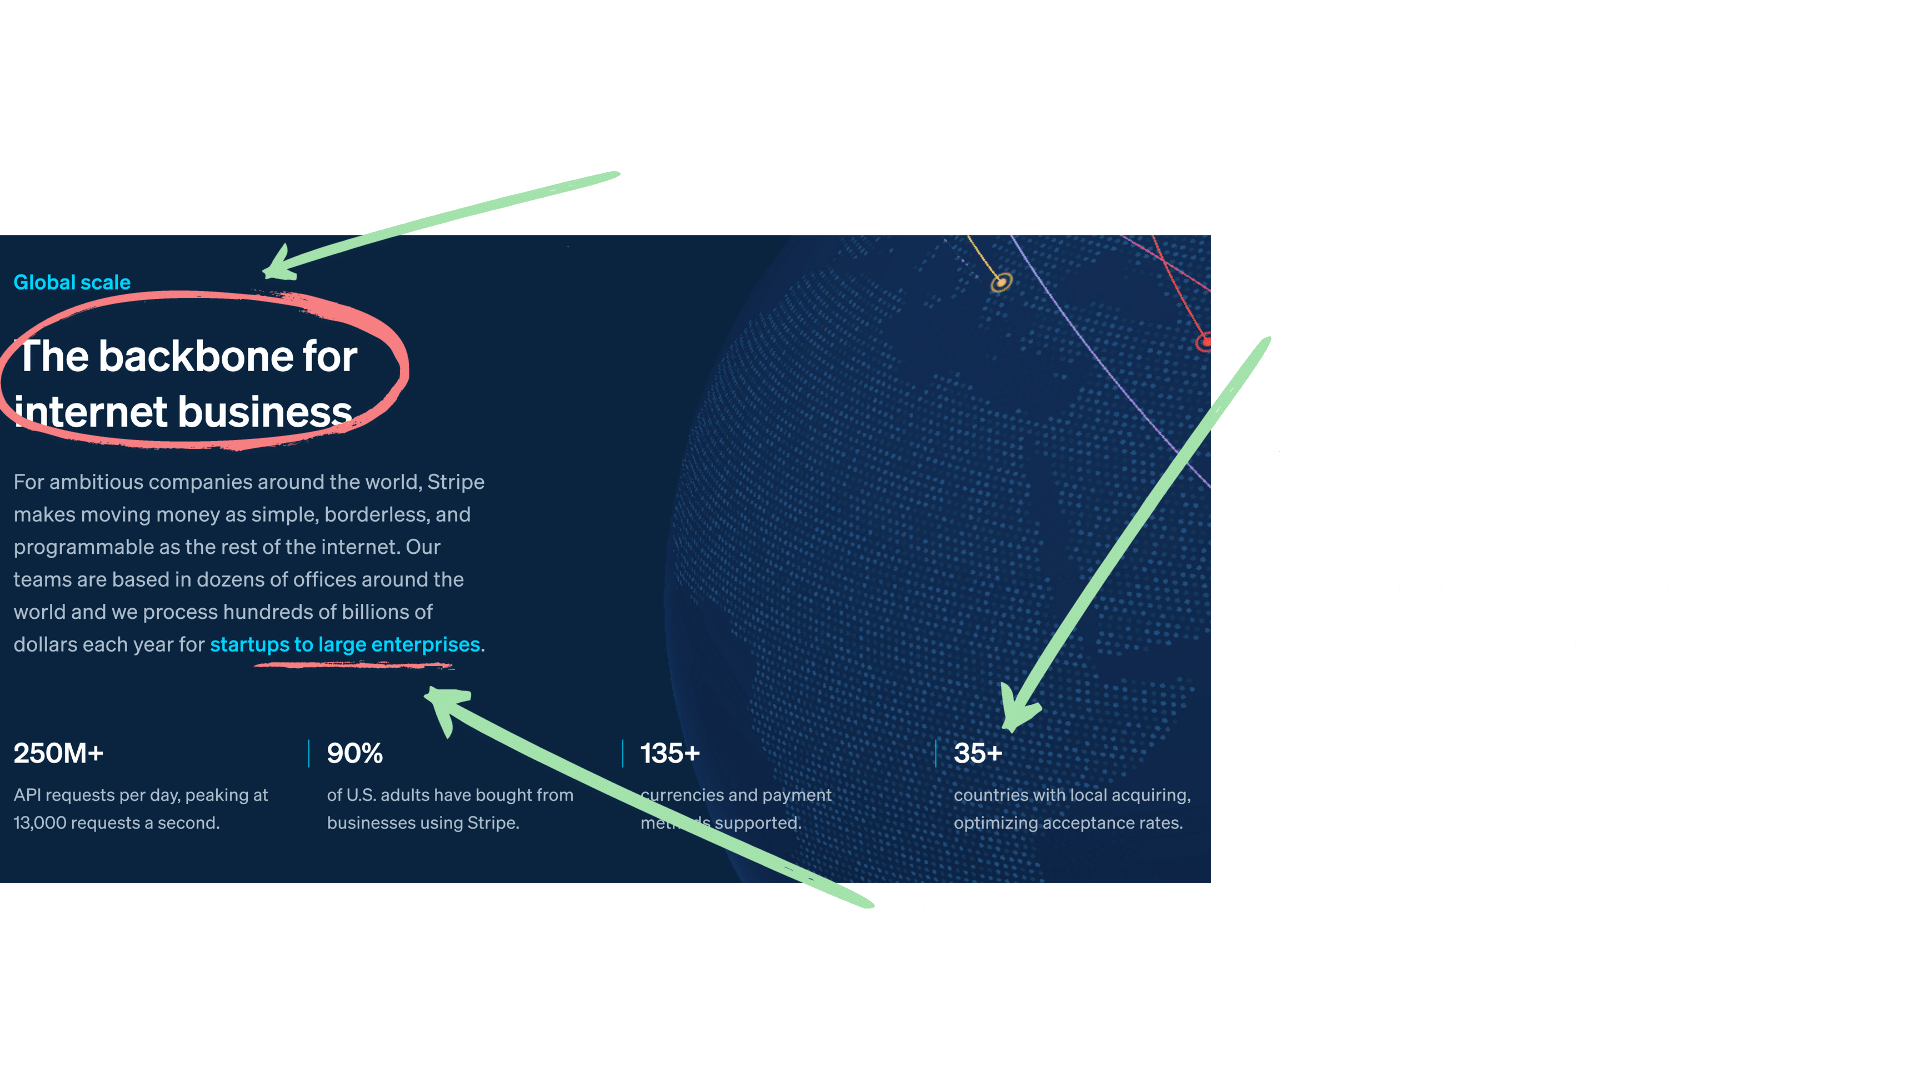 Stripe's reach and capabilities